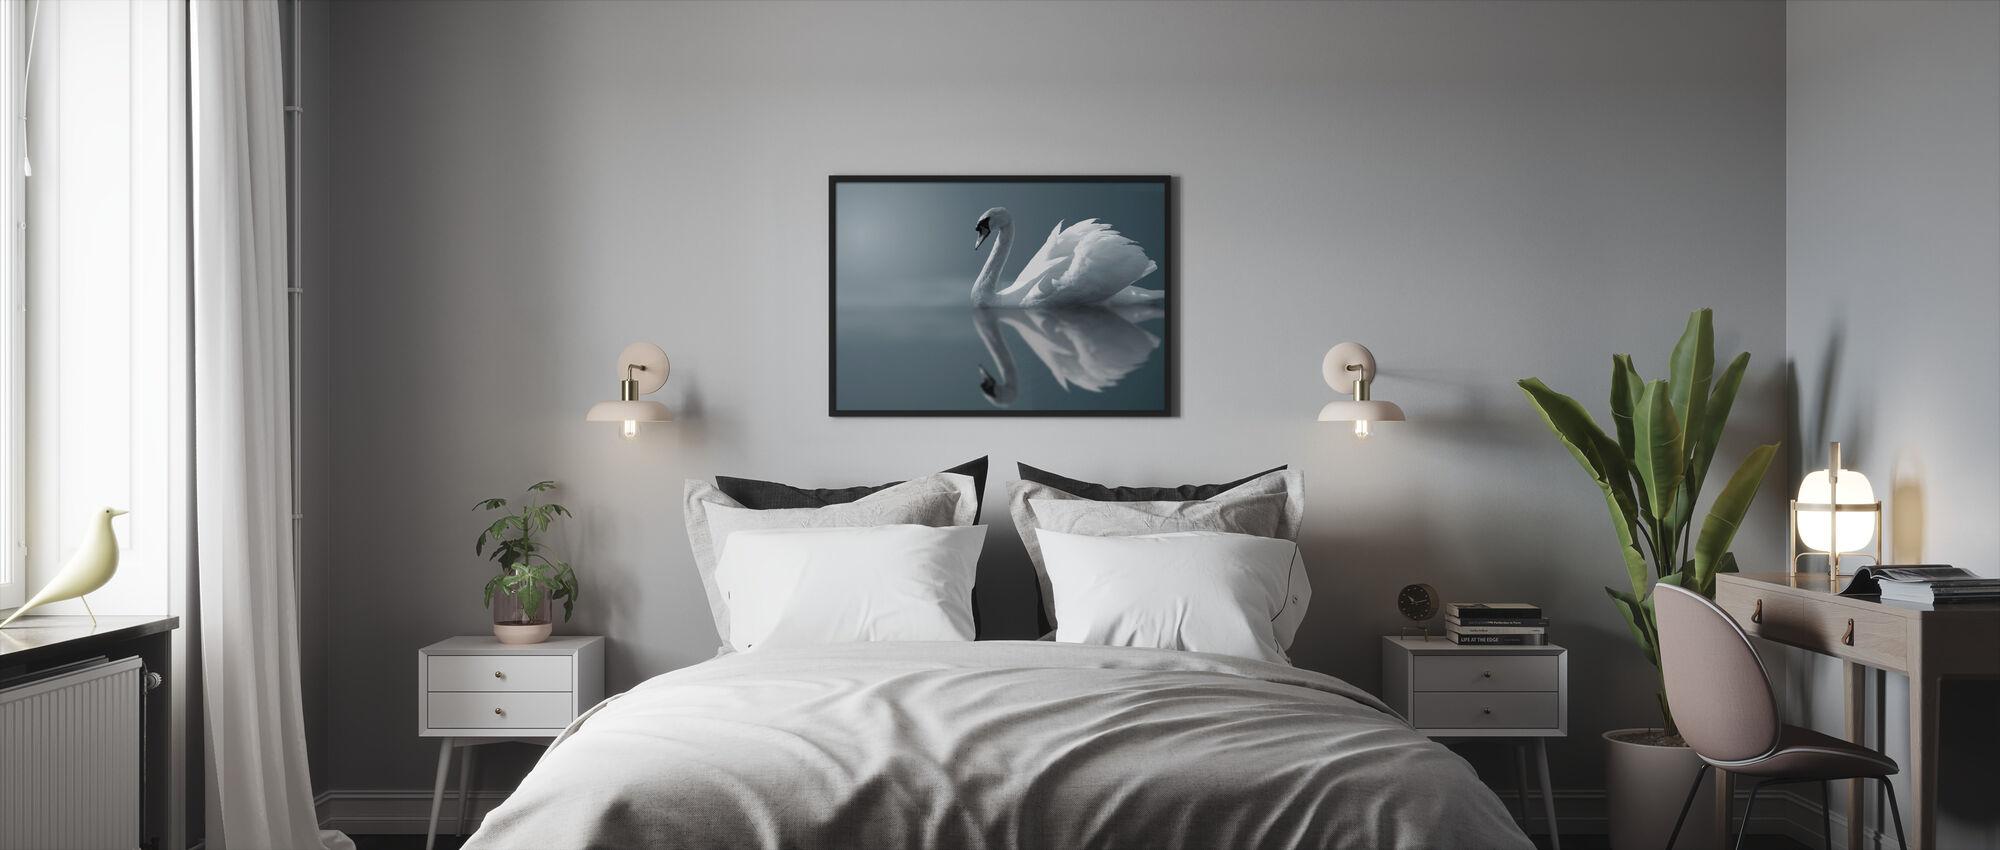 Swan Reflection - Framed print - Bedroom